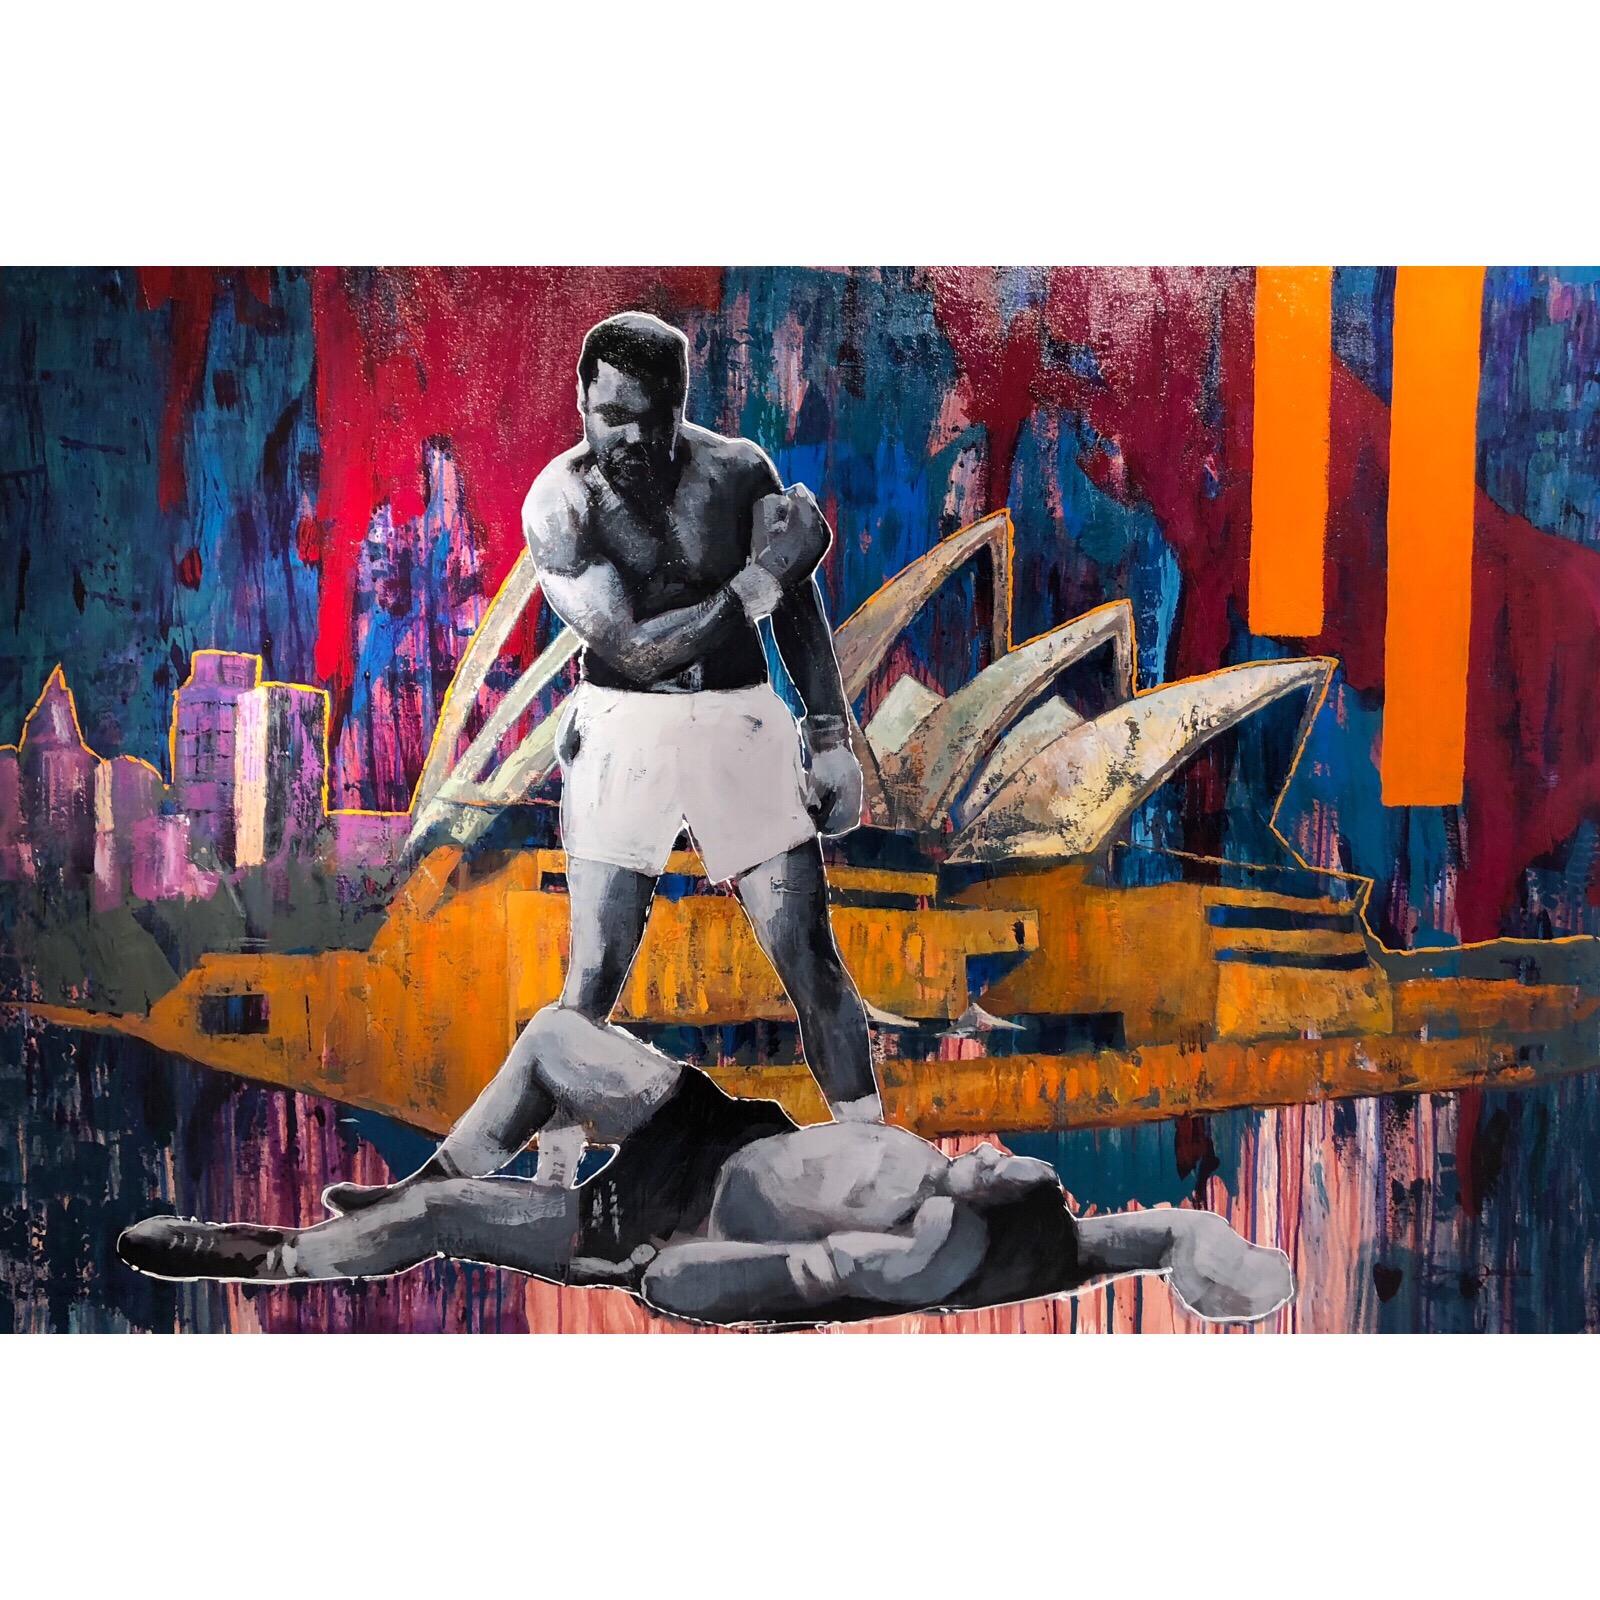 """Musical Knock-out"" Acrylic on canvas by Alberto Ramirez LEG & Jochen Vrba. 200x130 cm"